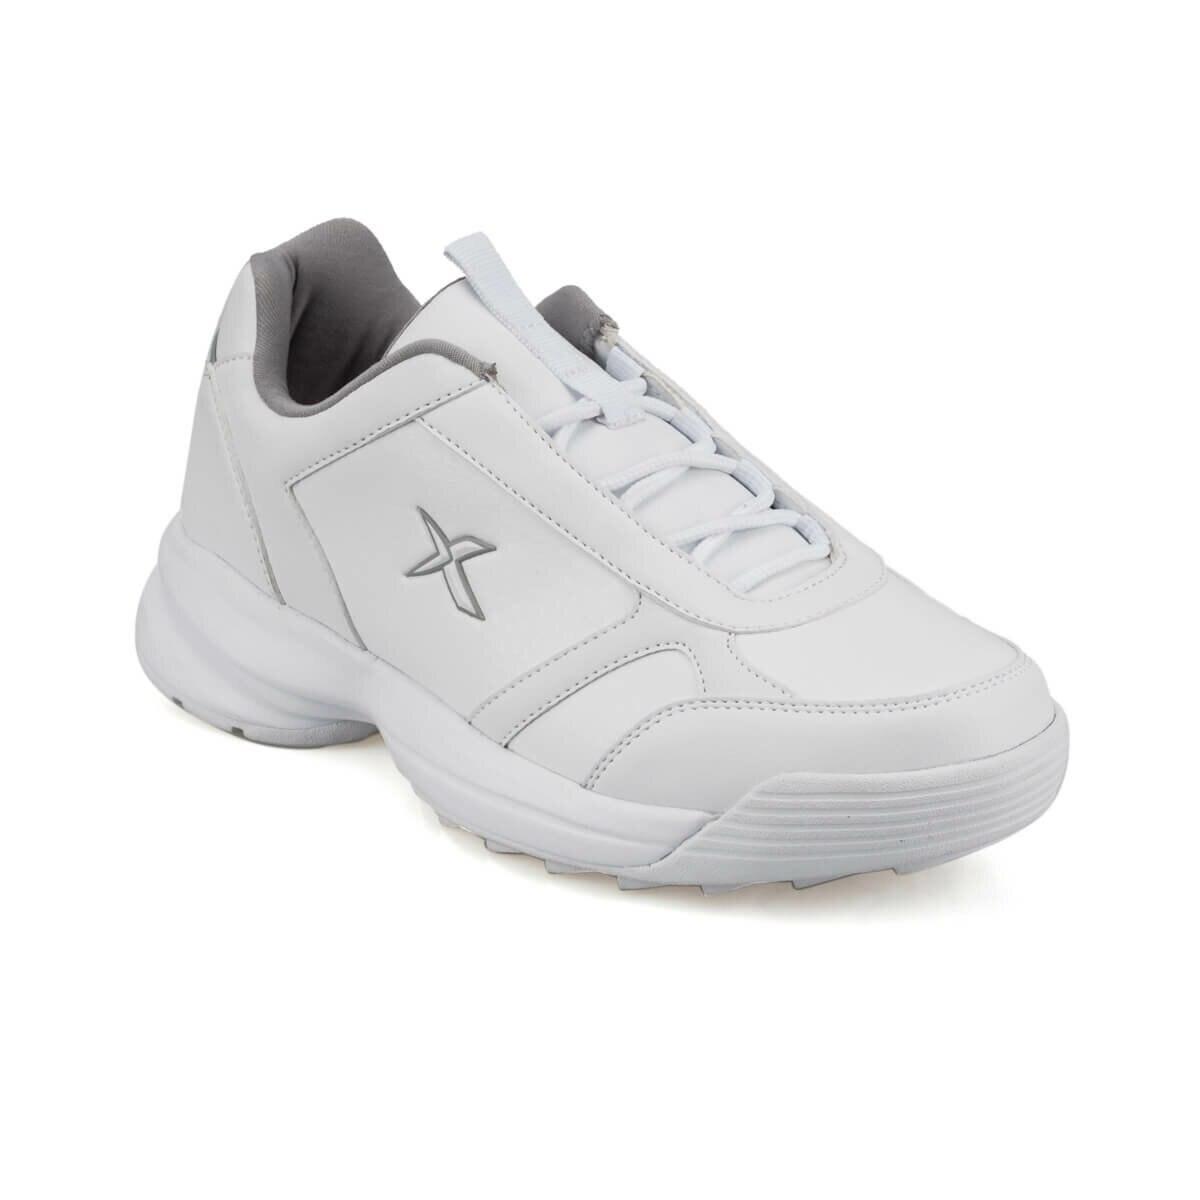 FLO Women Sneaker Fashion Comfortable Female Footwear Casual Sneaker Shoes White Black Кроссовки женские SAWYER W 9PR KINETIX